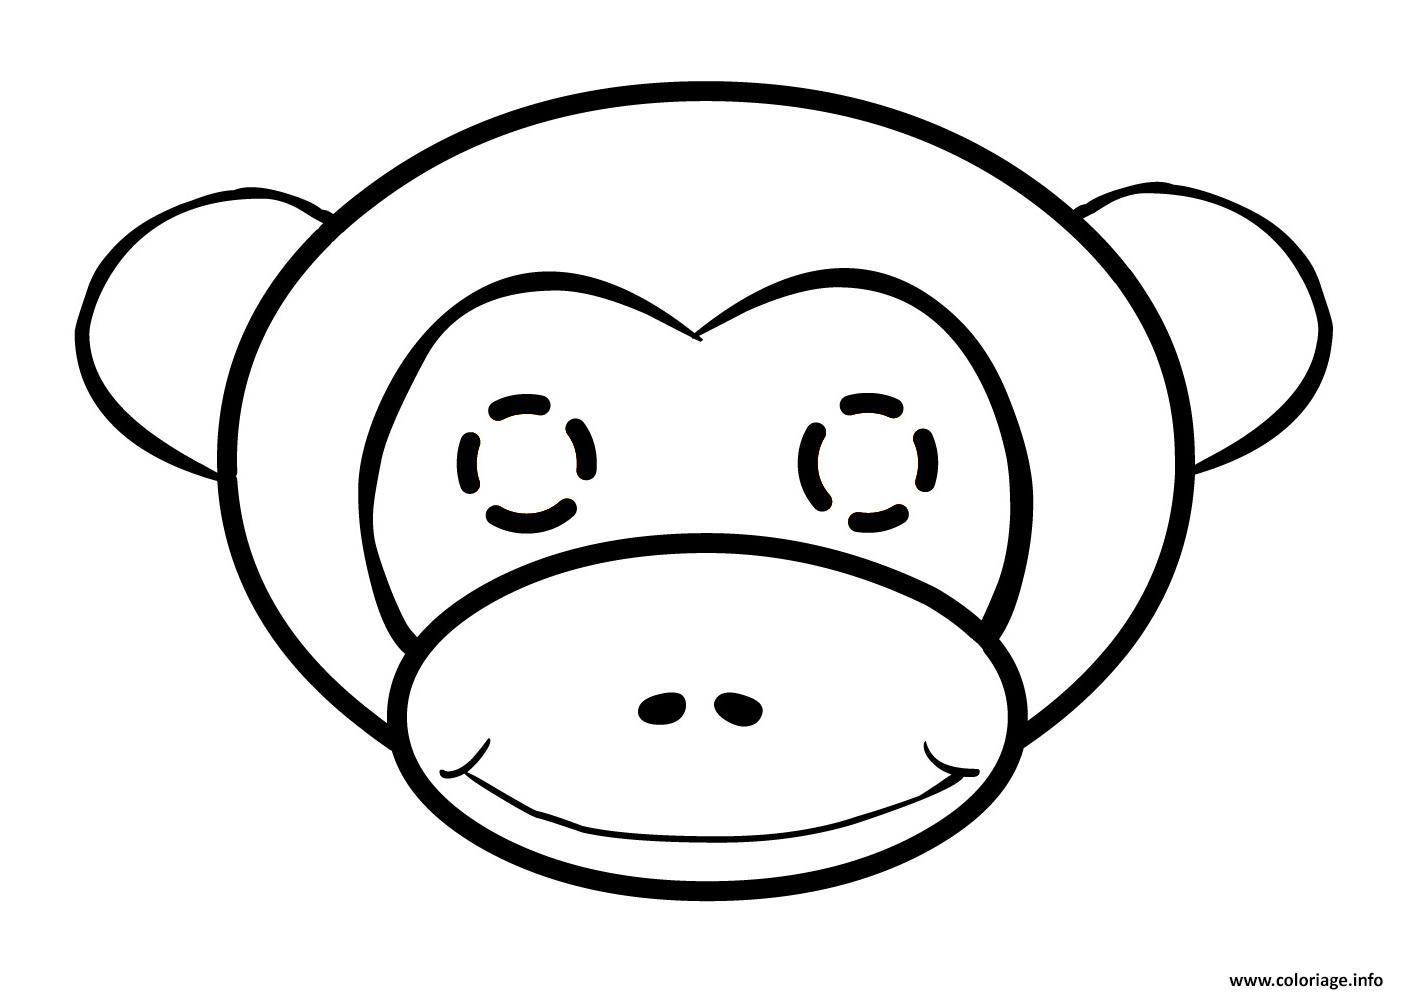 Coloriage A Imprimer Emoji Singe.Coloriage Tete De Singe Facile Dessin